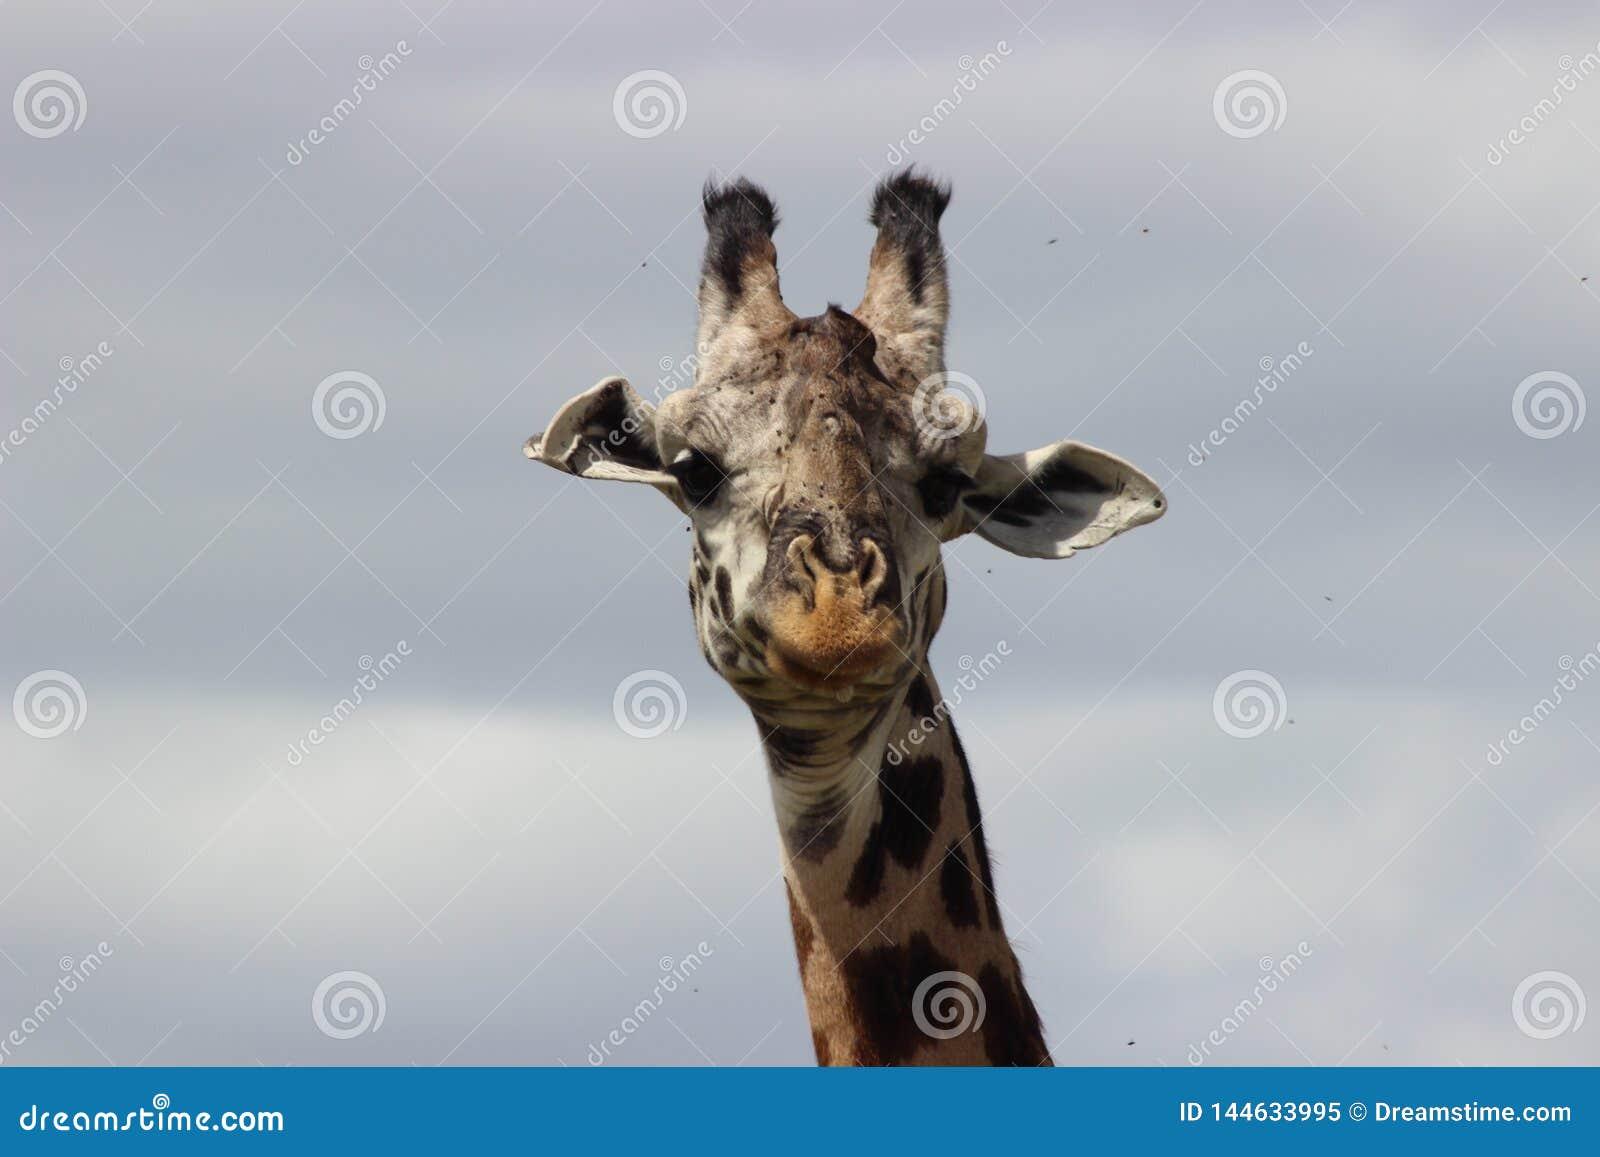 Head of a giraffe looking